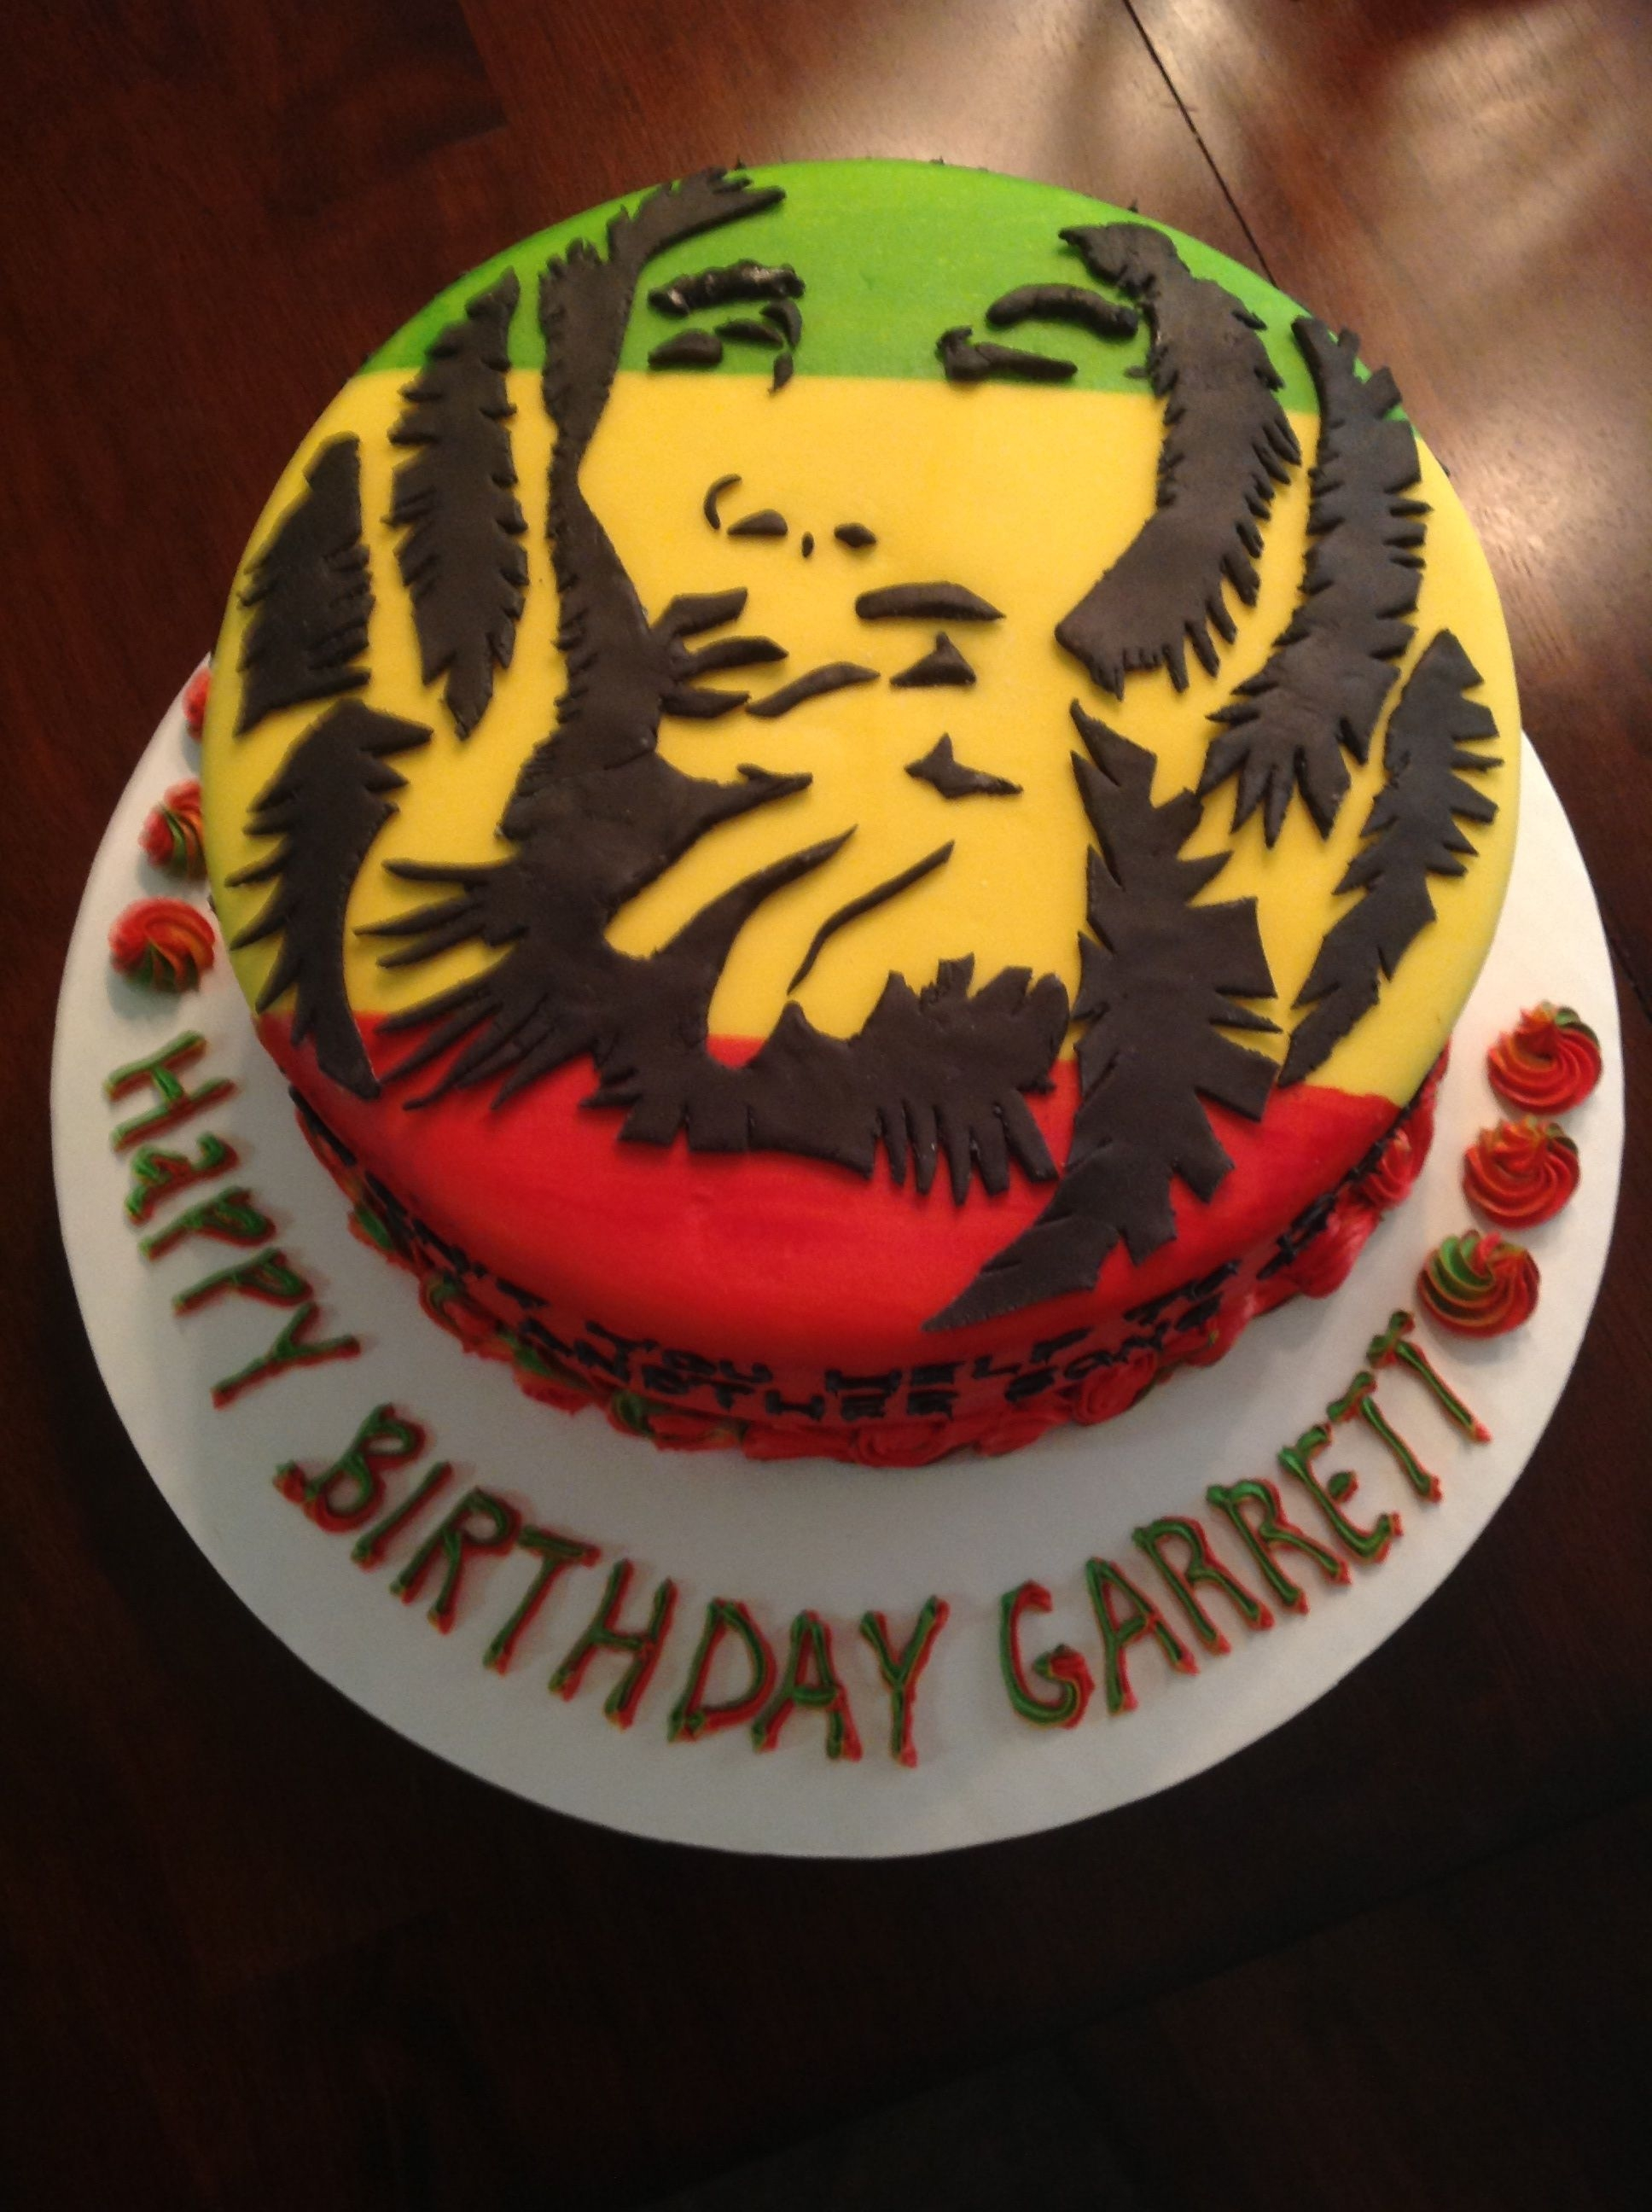 Outstanding Bob Marley Birthday Cakecentral Com Funny Birthday Cards Online Elaedamsfinfo